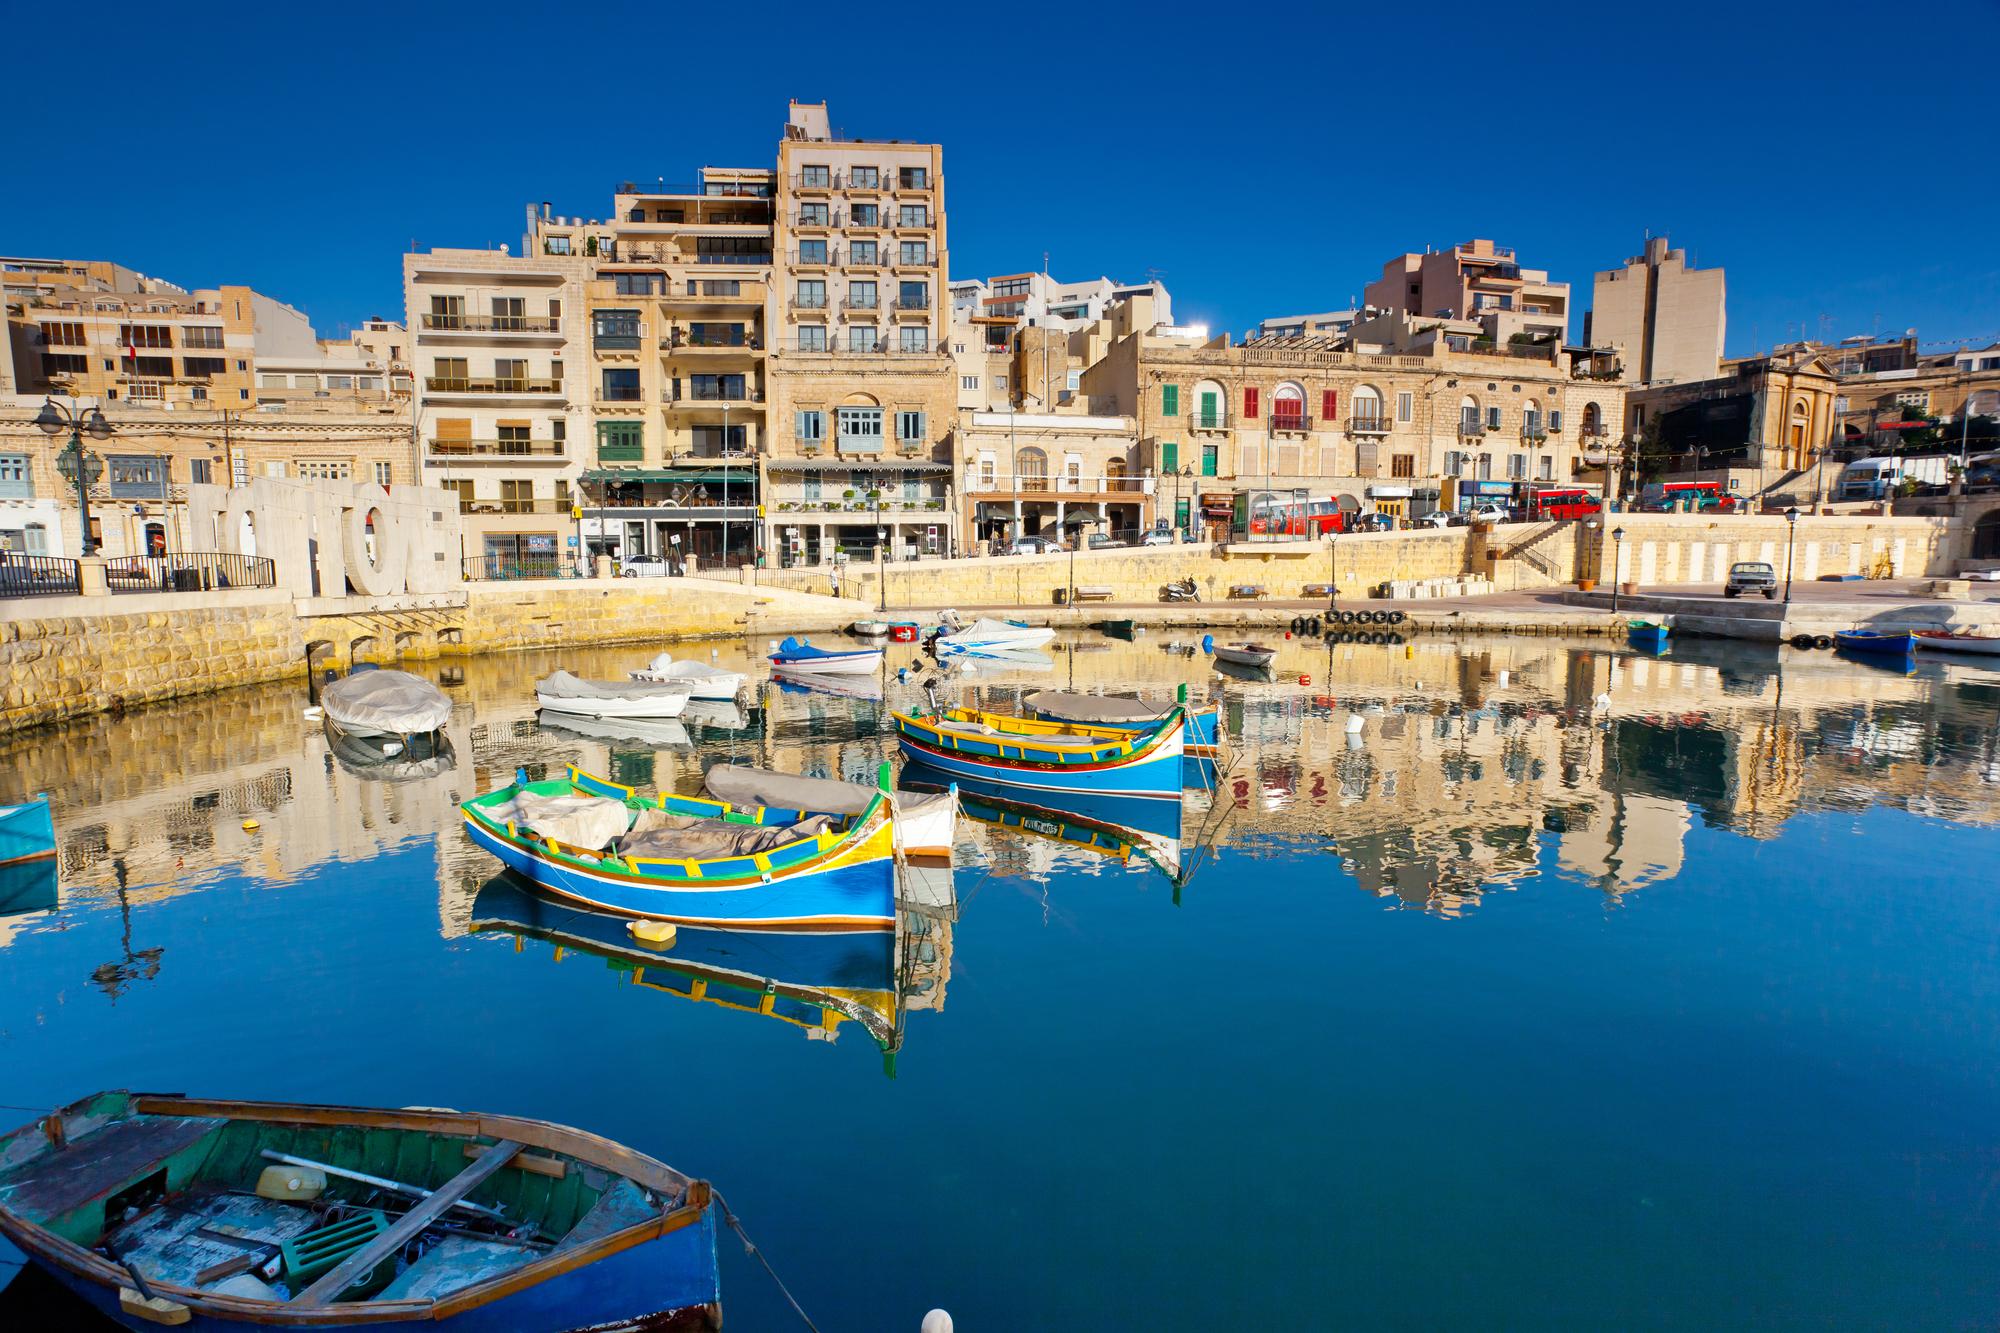 Ferry From Malta To Gozo Island